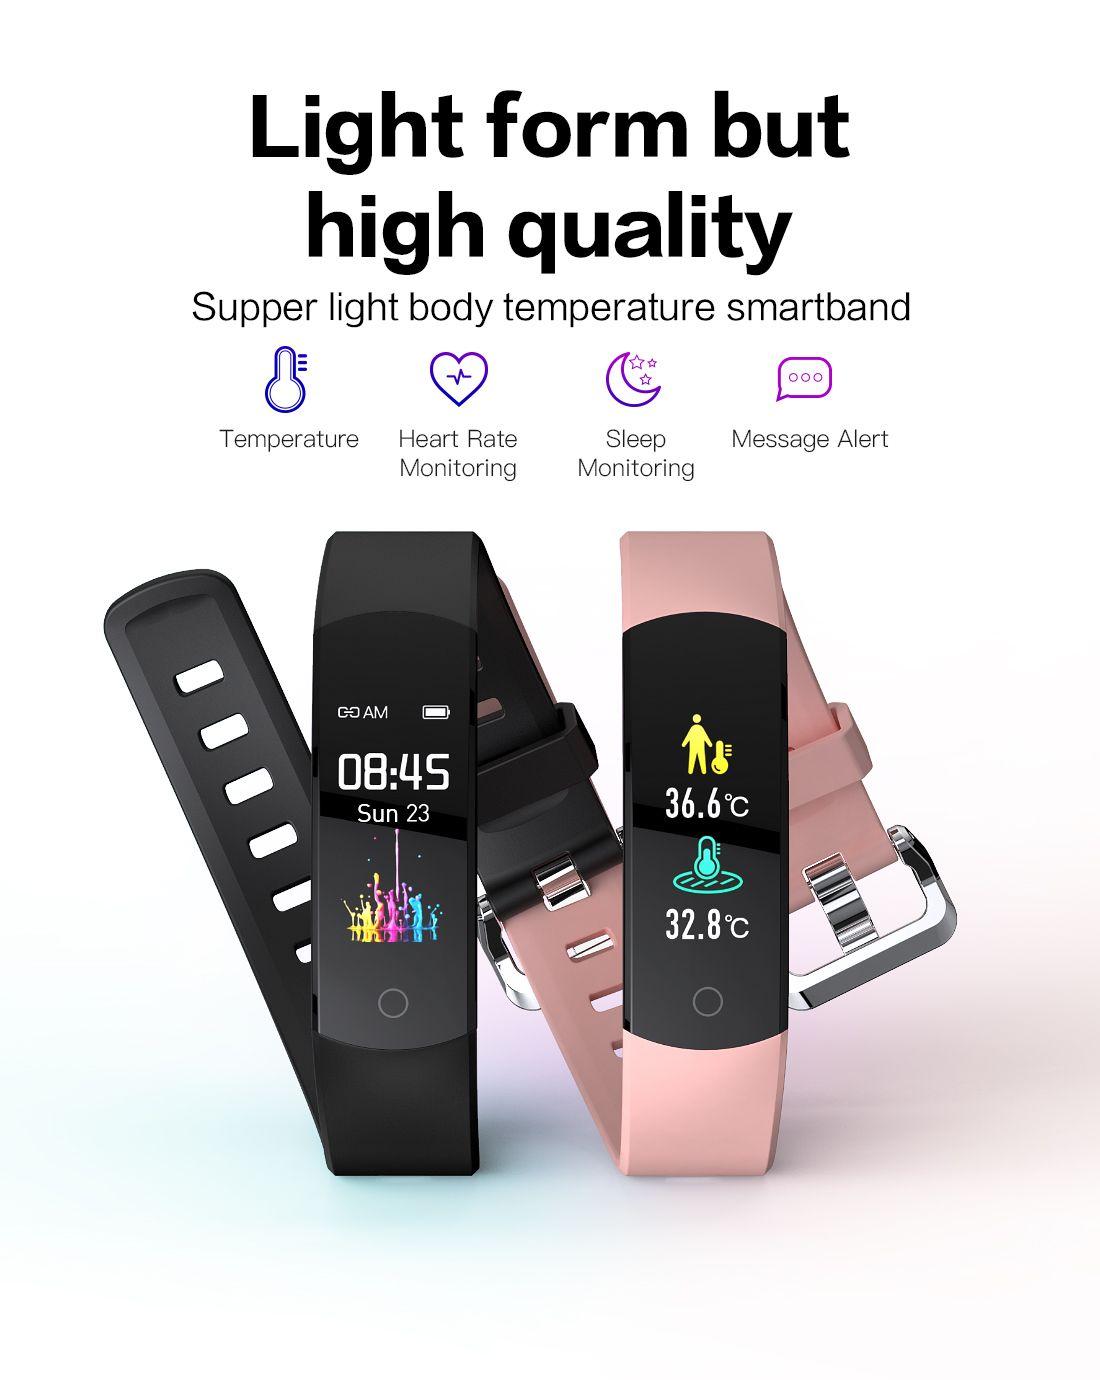 images?q=tbn:ANd9GcQh_l3eQ5xwiPy07kGEXjmjgmBKBRB7H2mRxCGhv1tFWg5c_mWT Smartwatch Qs19